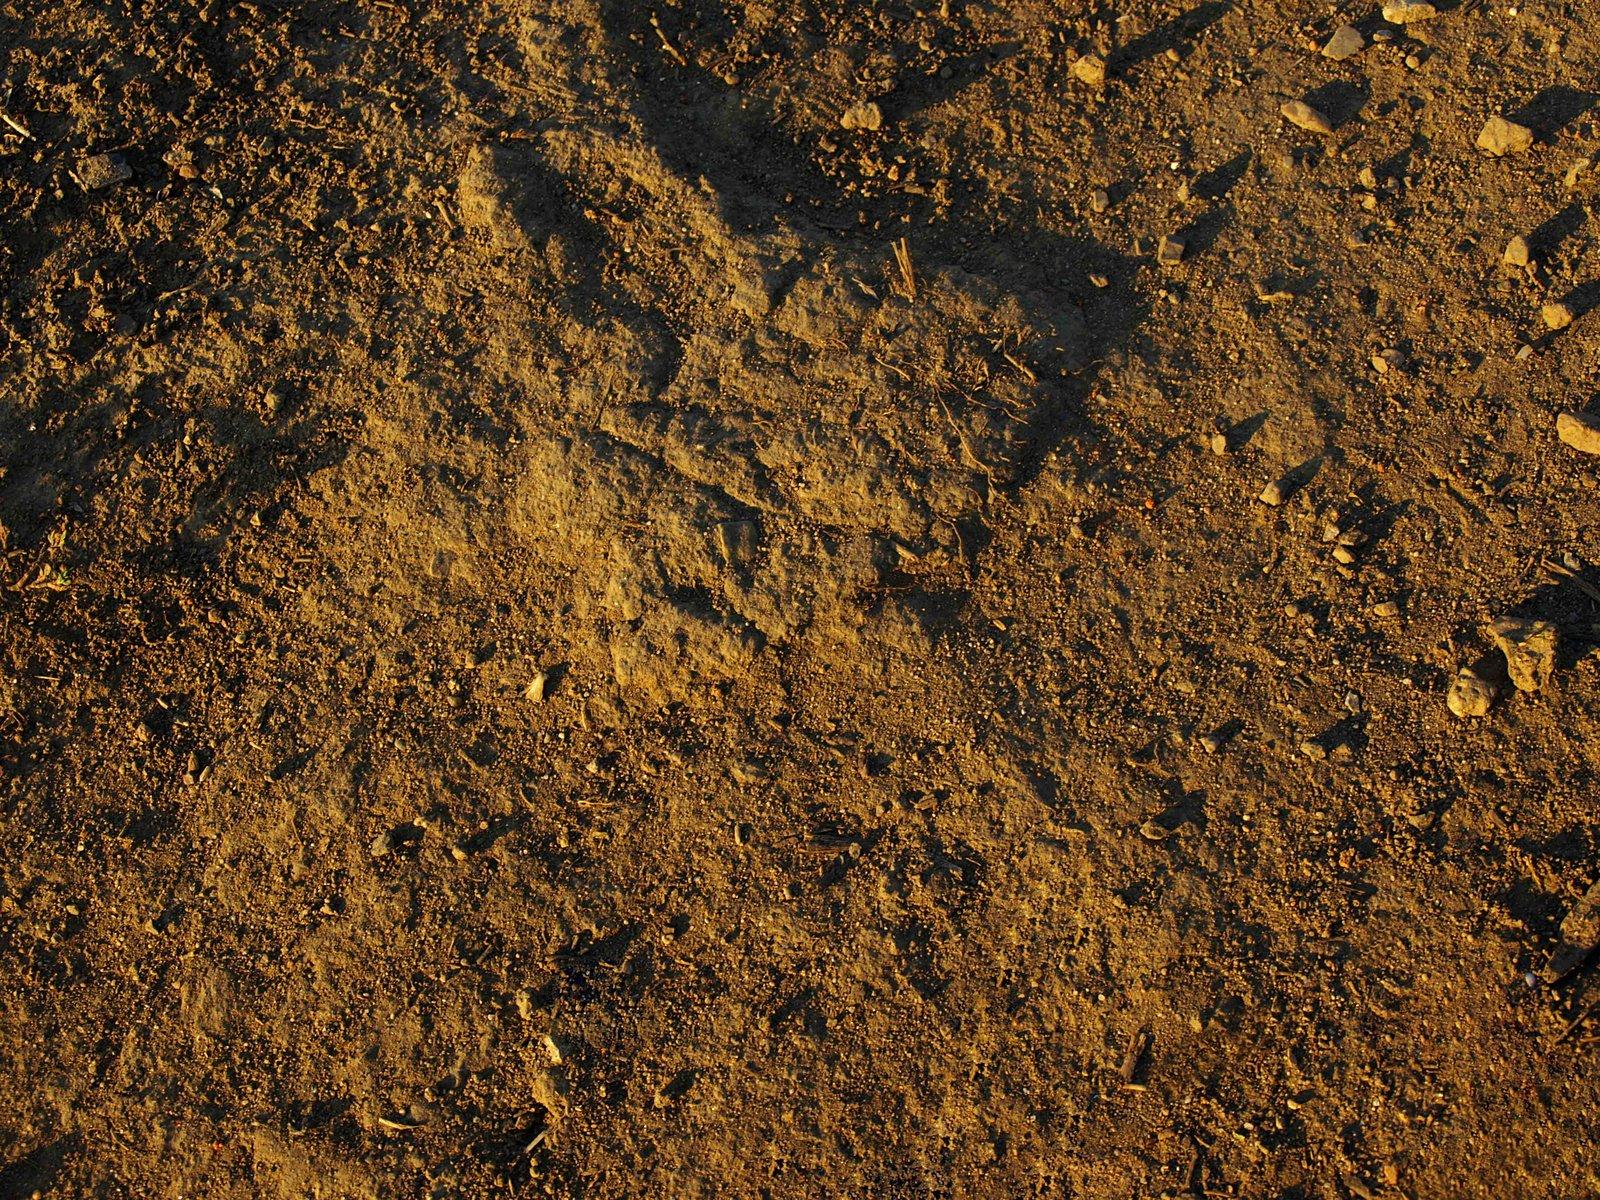 Free Dirt Texture Stock Photo - FreeImages.com